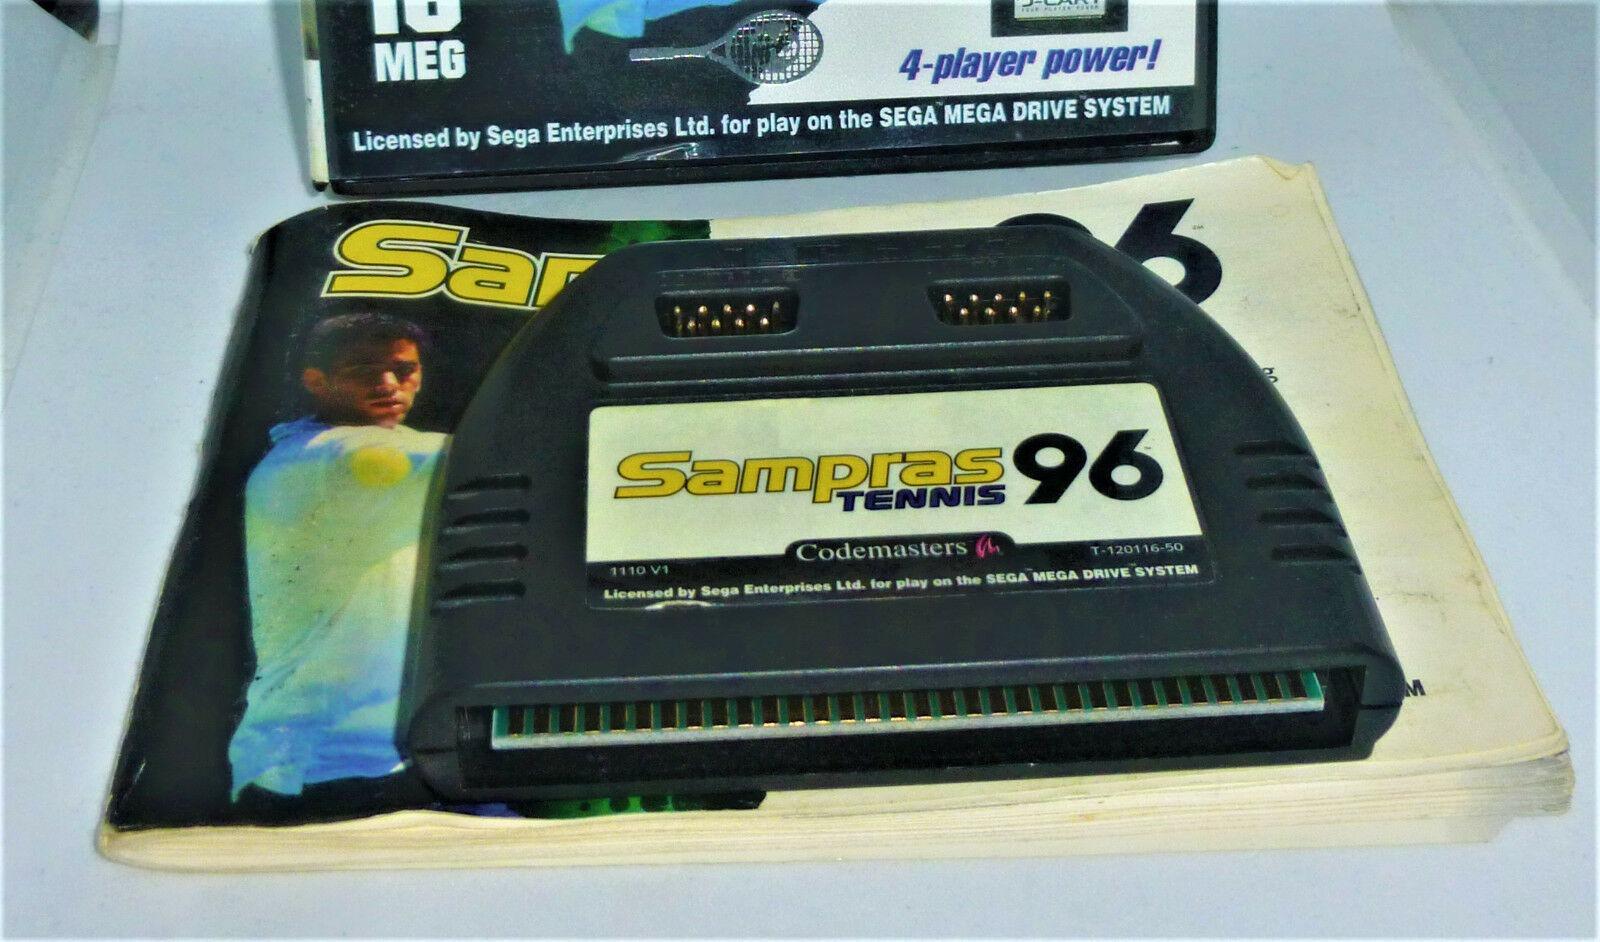 Sampras Tennis 96 - Codemasters 4